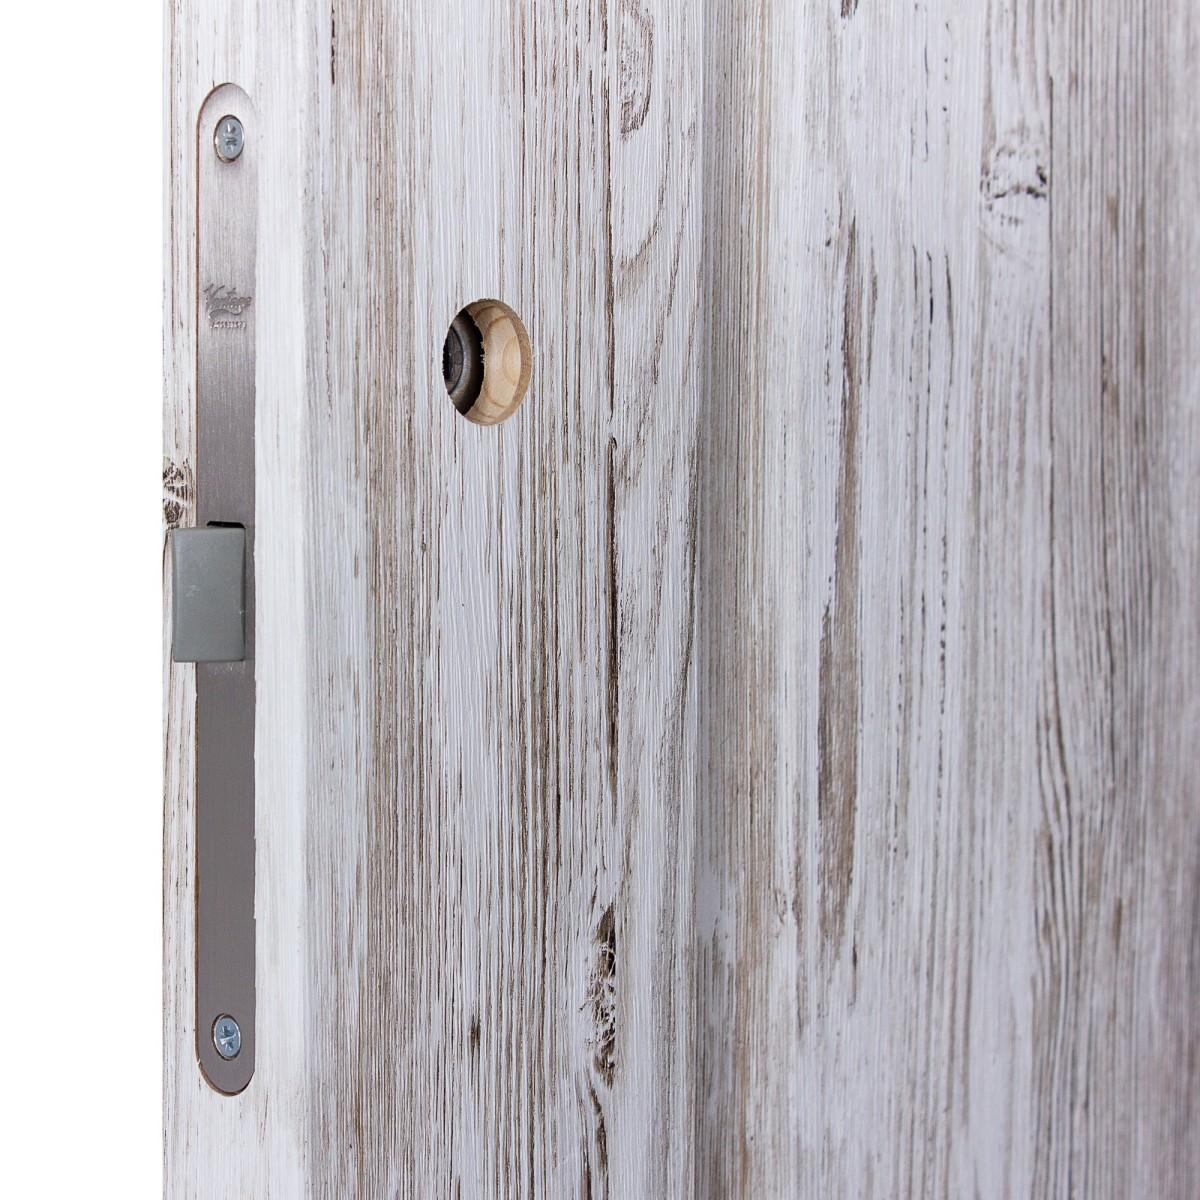 Дверь Межкомнатная Глухая Рустик 90x200 Цвет Северная Сосна